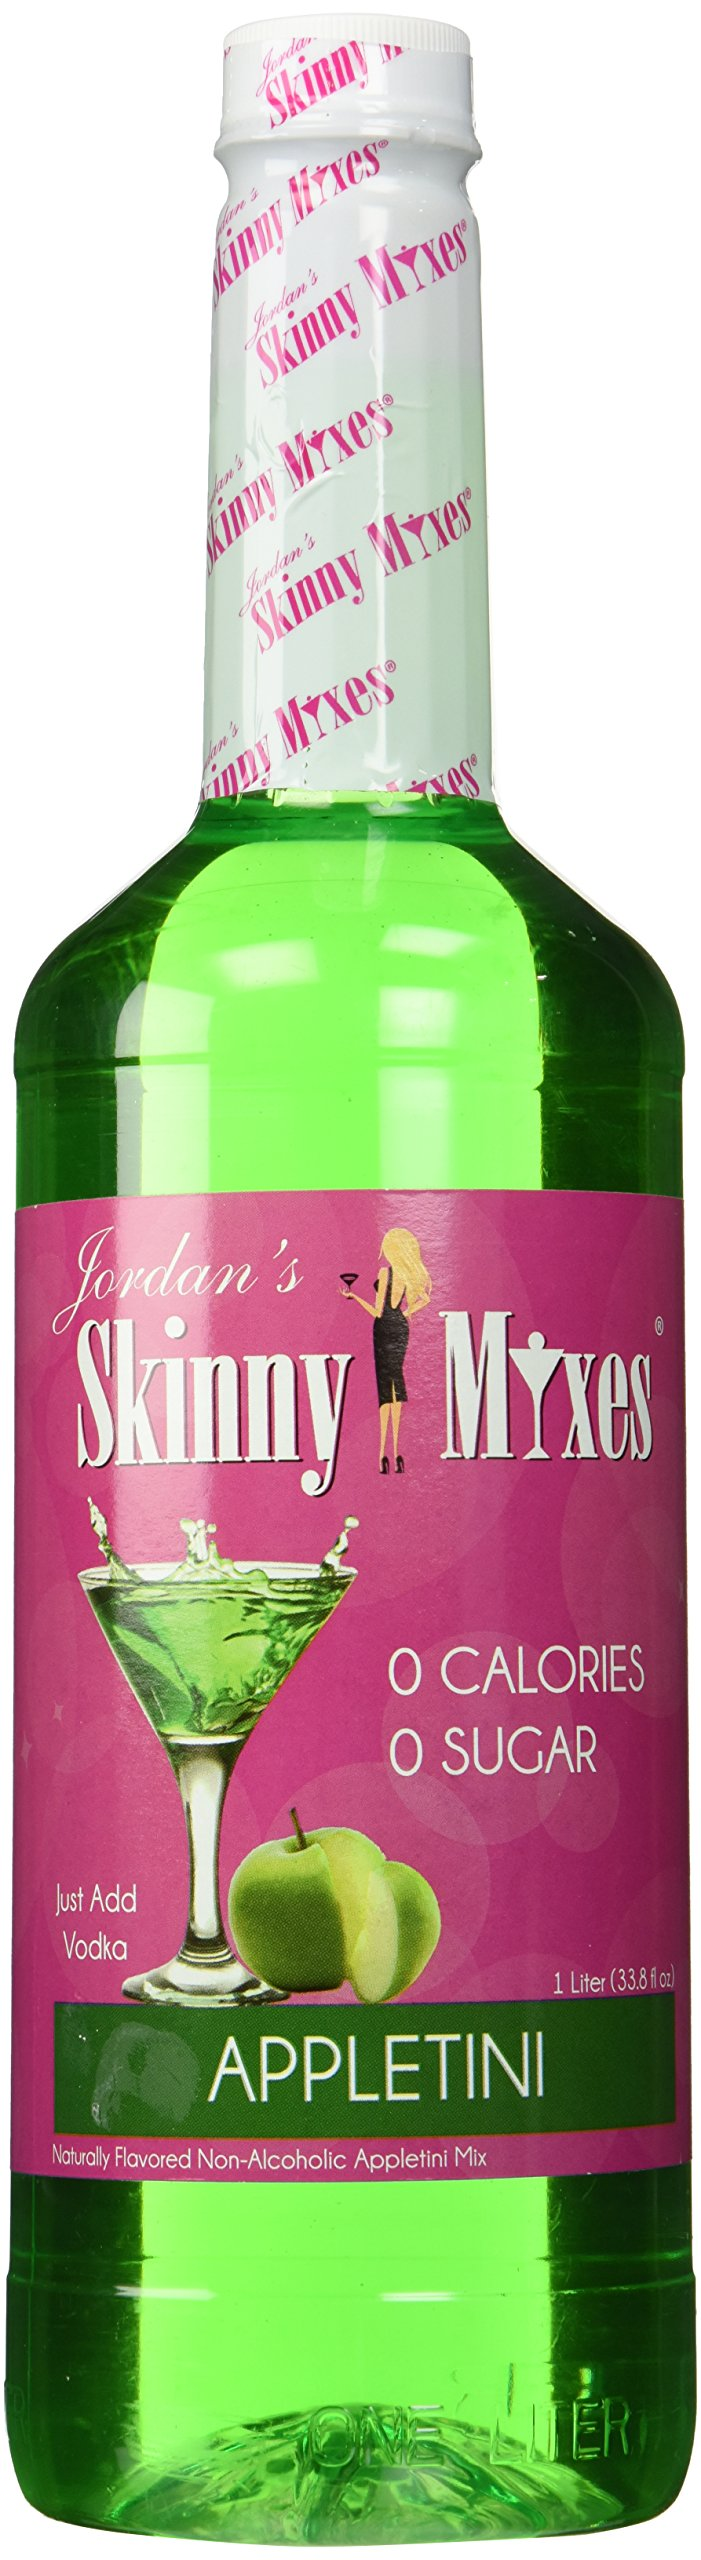 Appletini- Jordan's Skinny Mixes - Sugar Free, 1 Liter (33.8 fl oz)